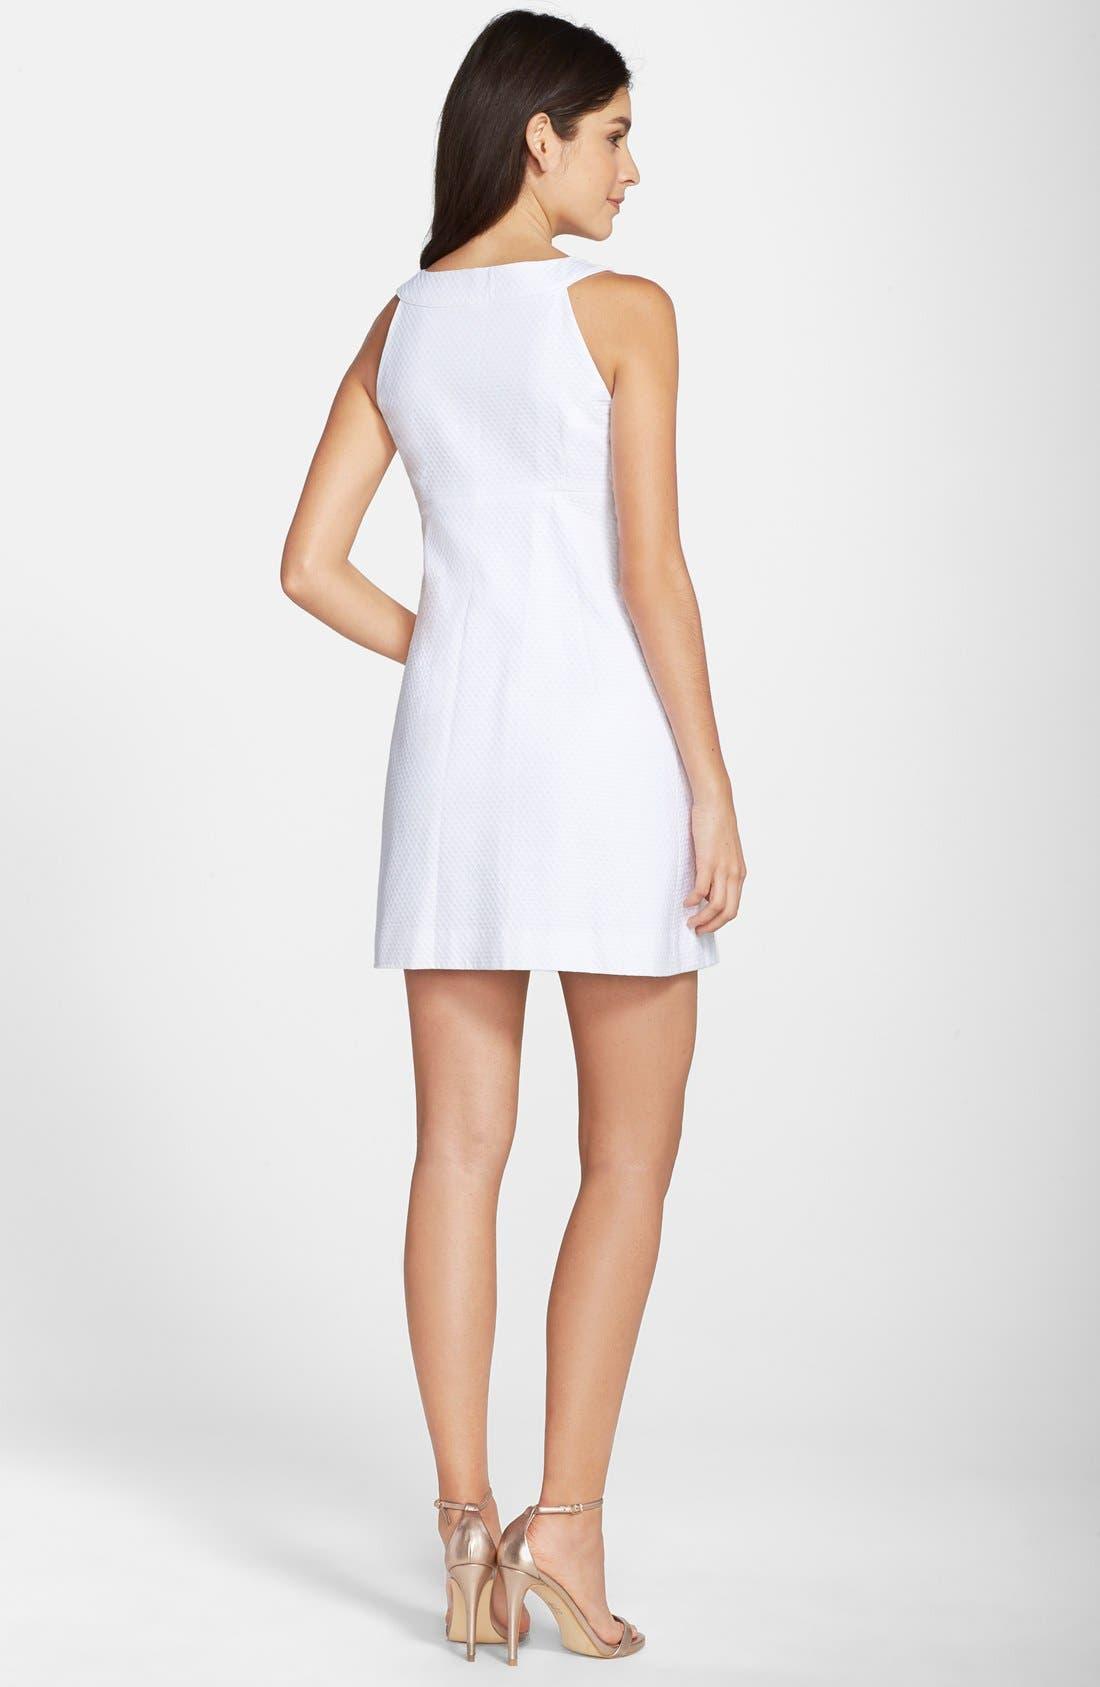 Lilly Pulitzer Jacqueline Shift Dress